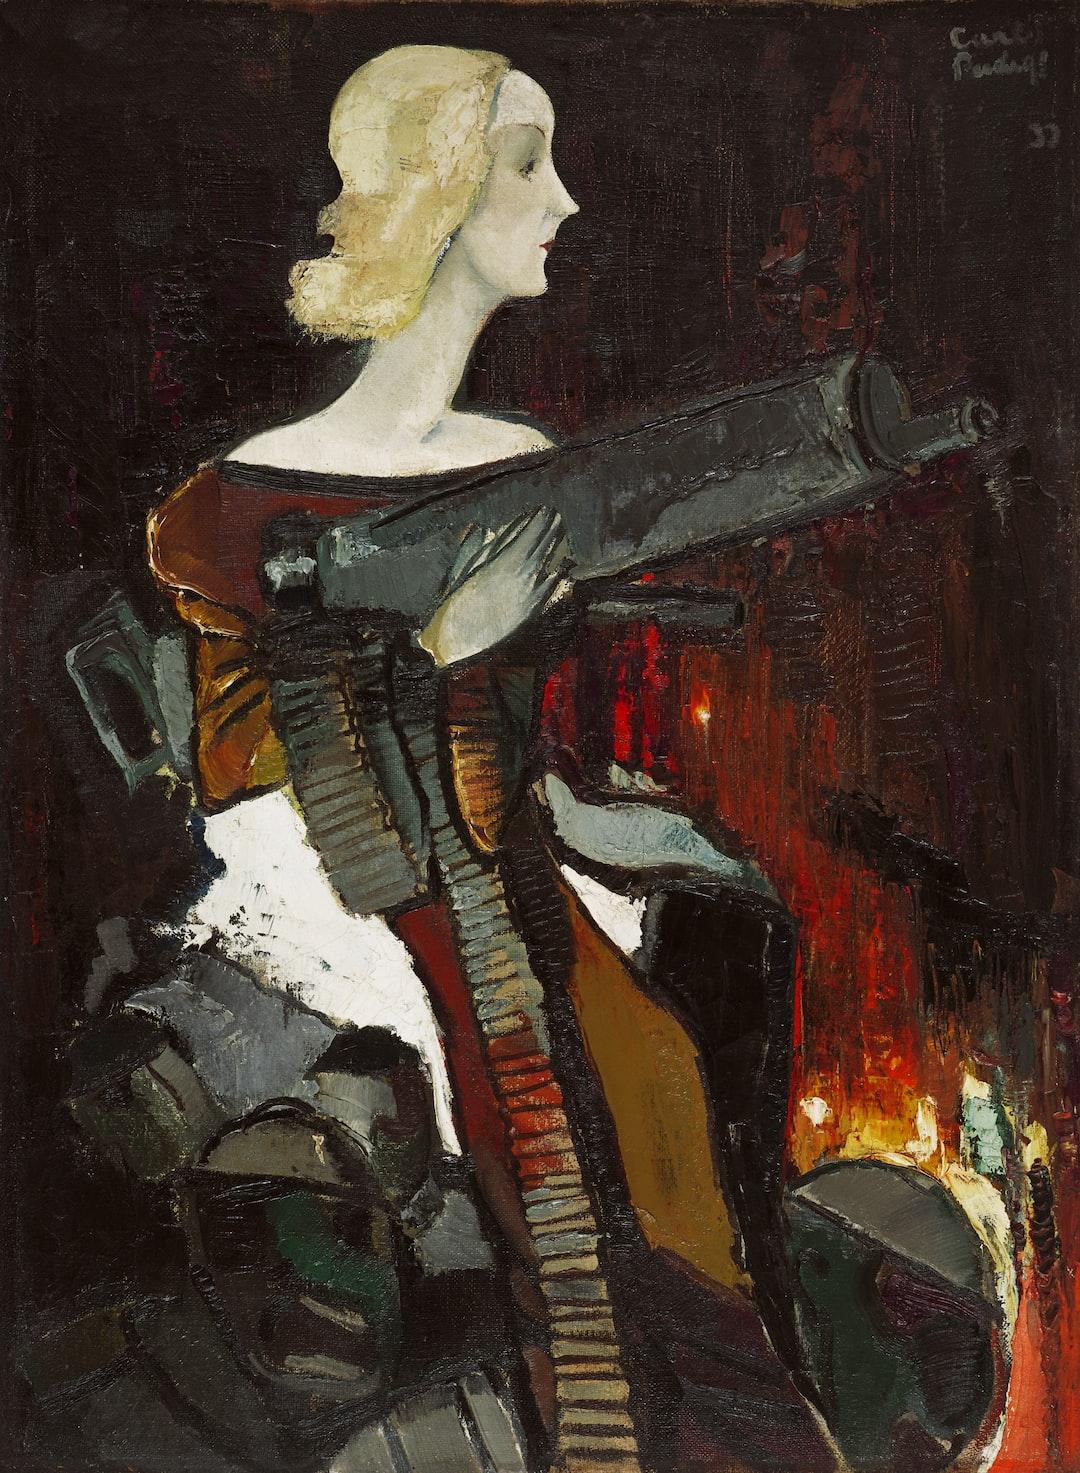 Madonna with Machine Gun. Creator: Kārlis Padegs. Date: 1932. Institution: Latvijas Nacionālais mākslas muzejs. Provider: Europeana 280. Providing Country: Latvia. PD for Public Domain Mark